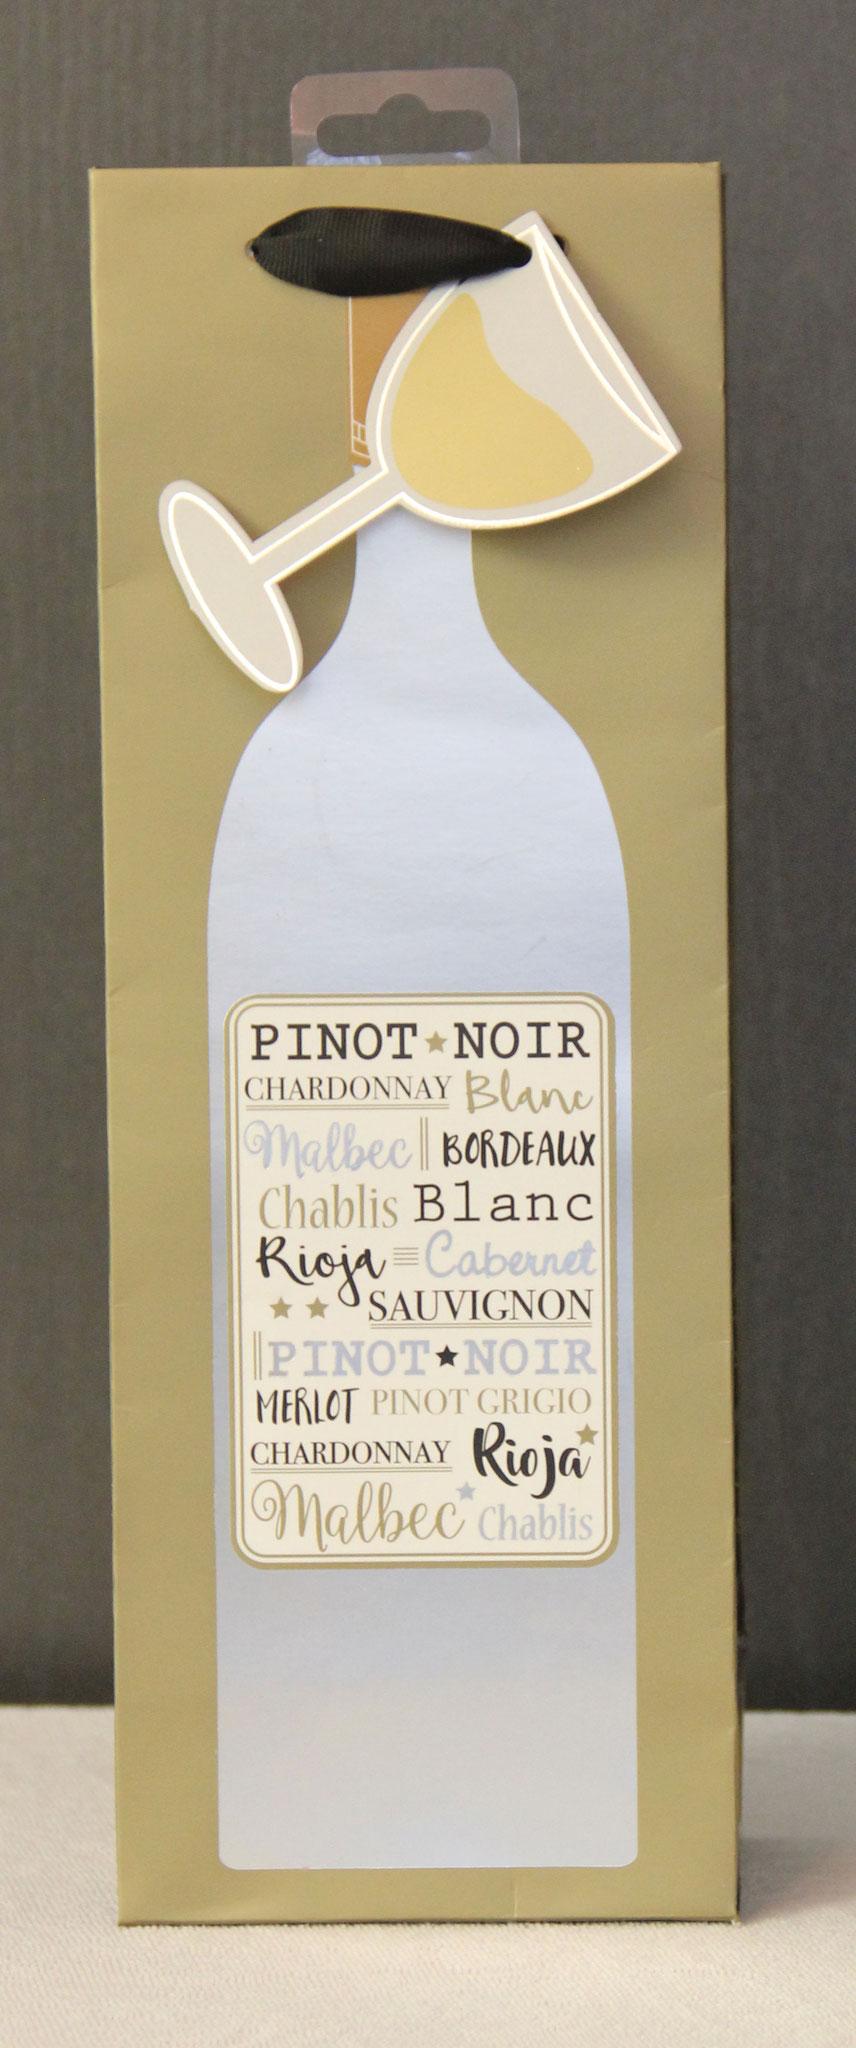 Nr. 24711-4 Format Flasche